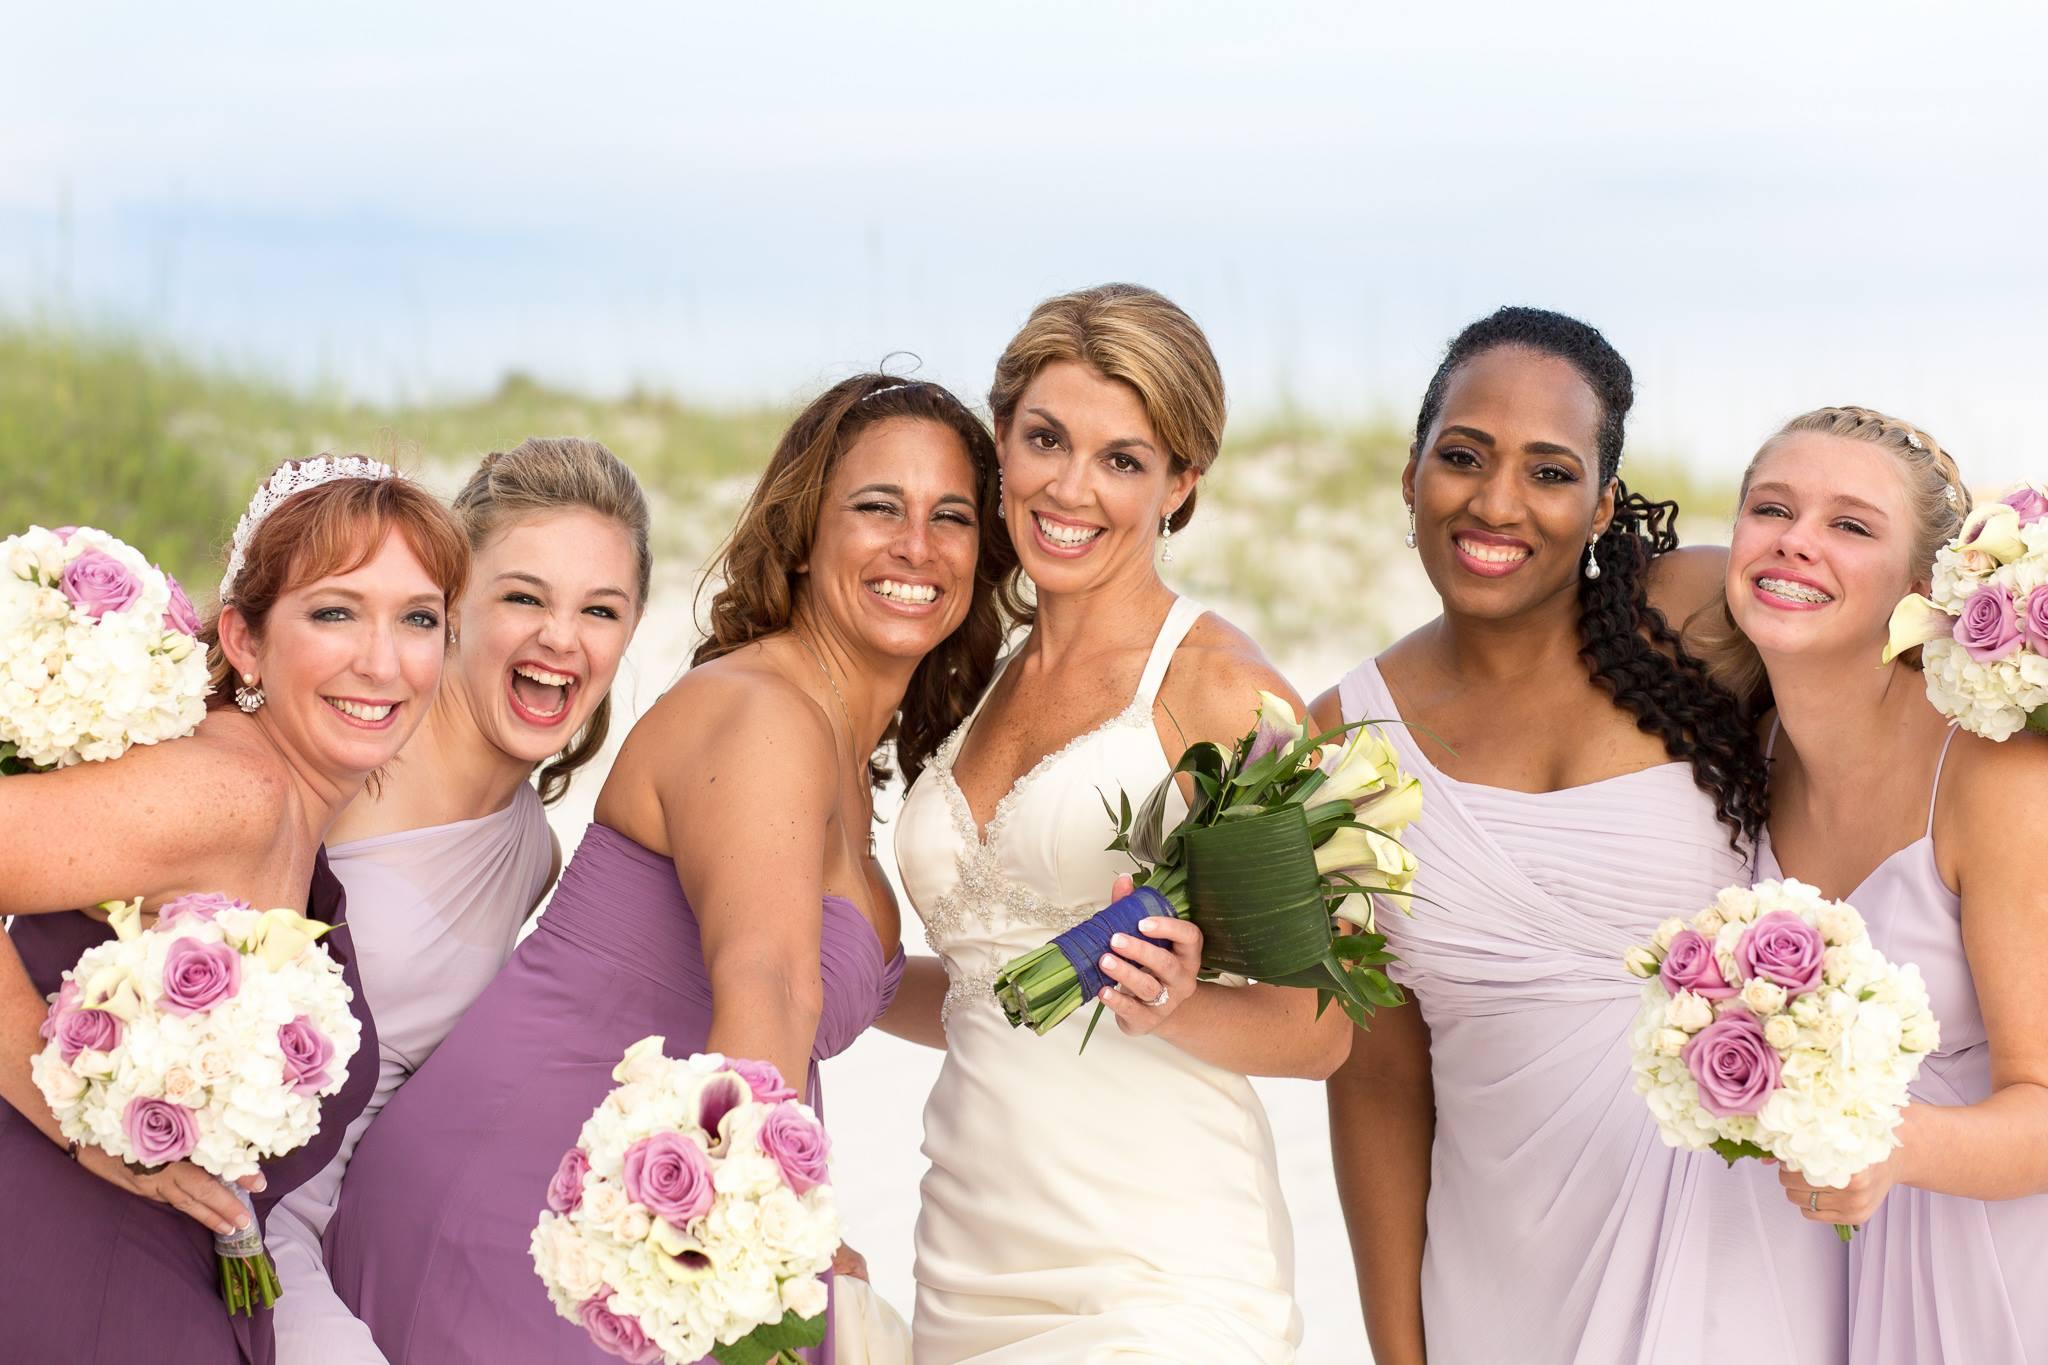 Perdido Beach Resort wedding photo of a bride and her brides maids